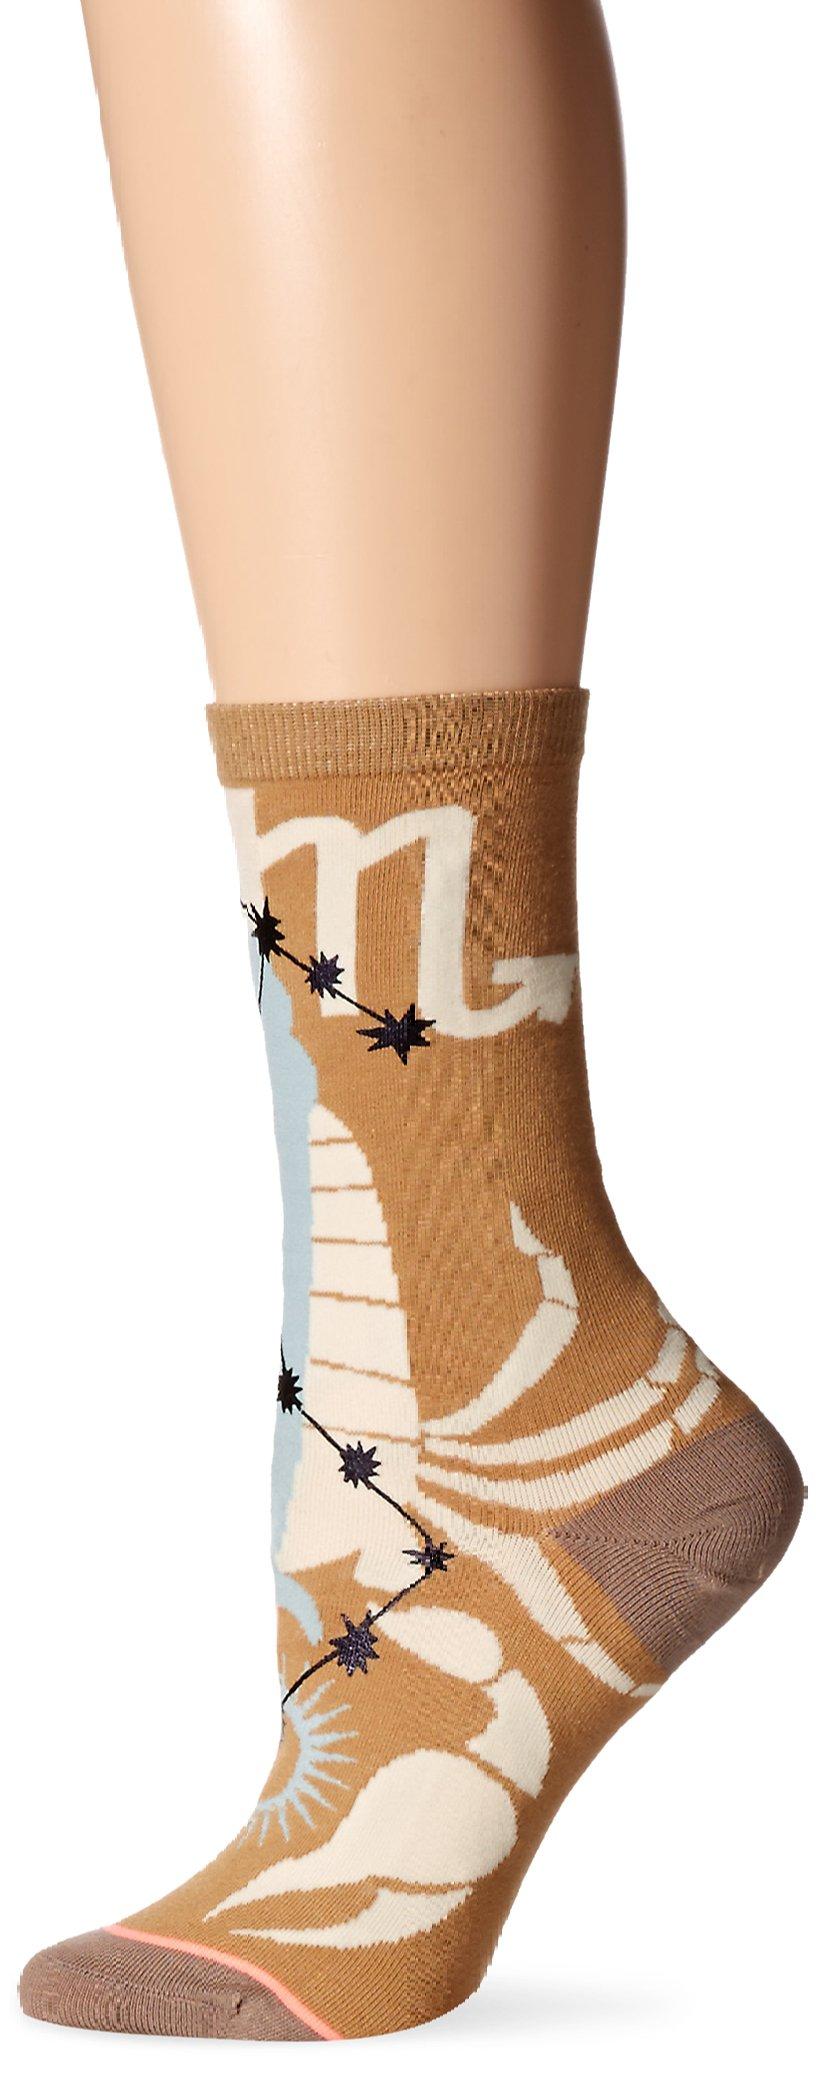 Stance Women's Zodiac Crew Sock, Scorpio, Medium